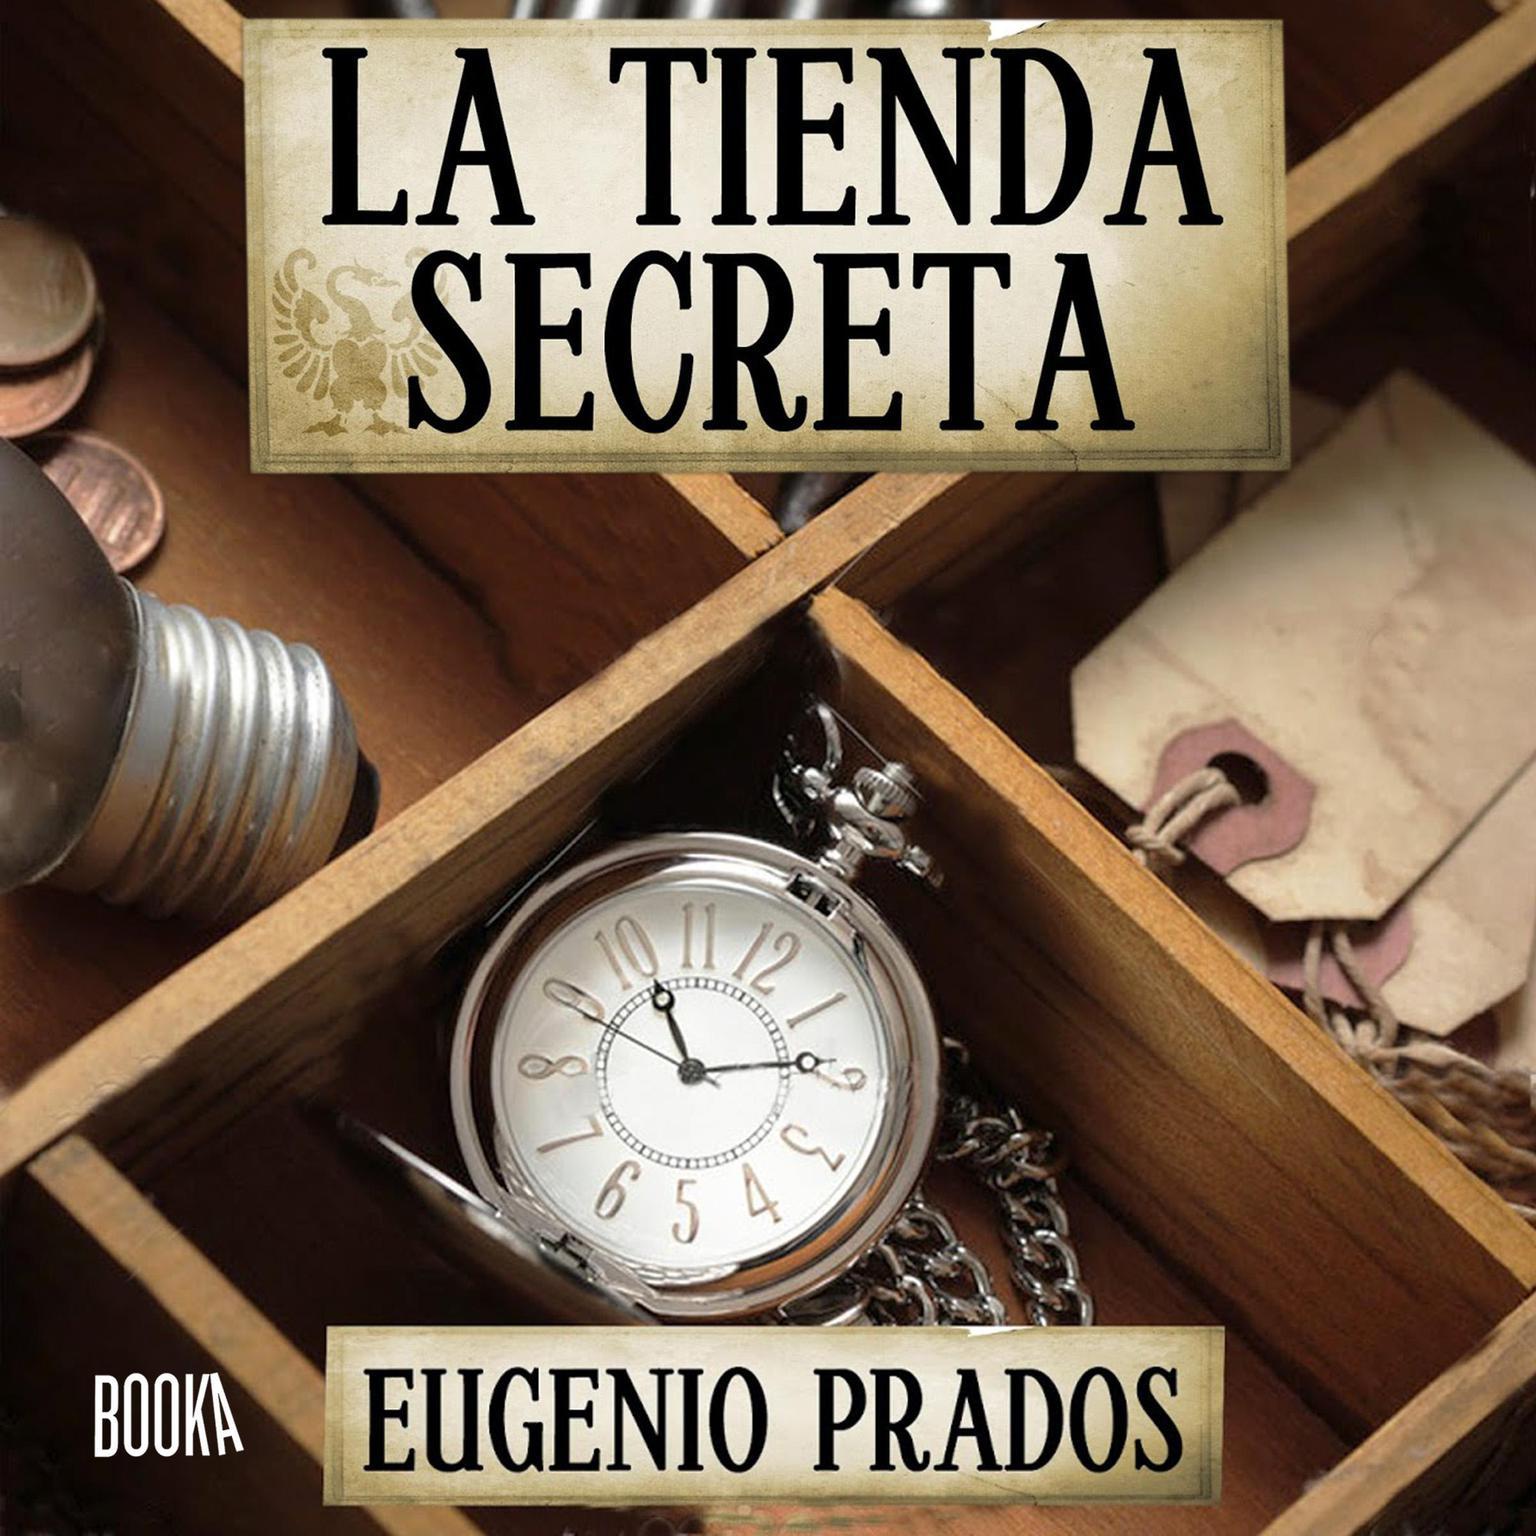 La Tienda Secreta Audiobook, by Eugenio Prados